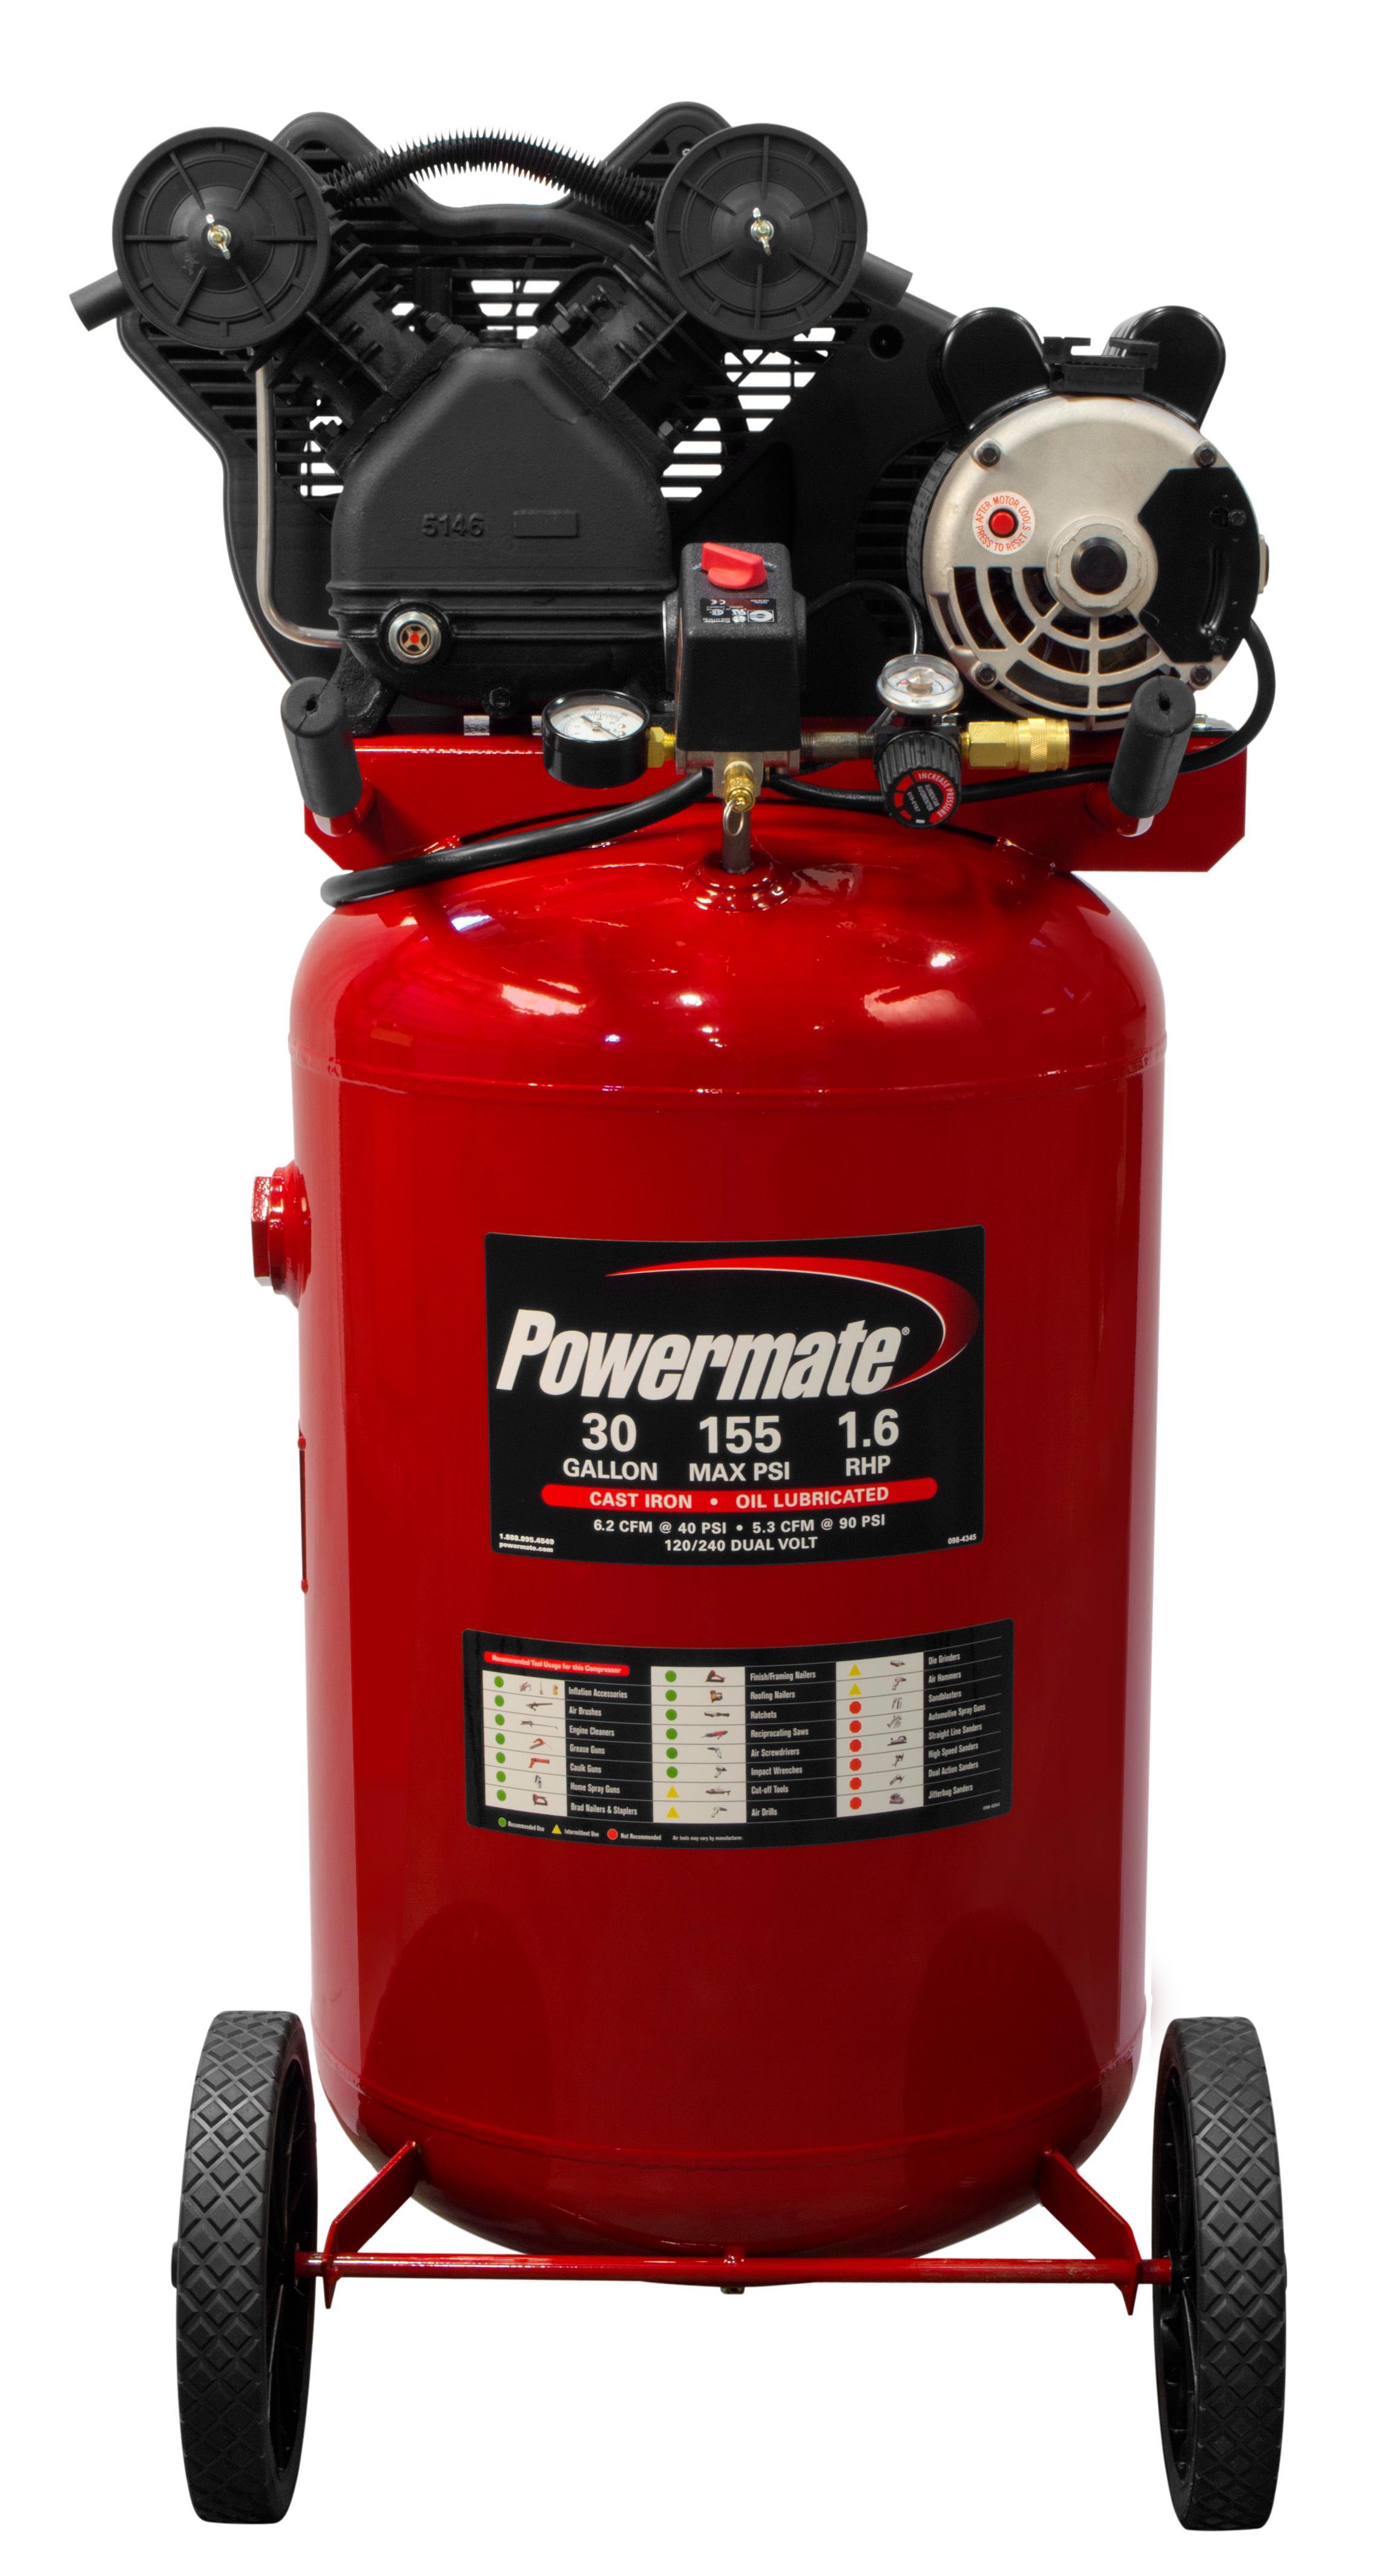 Amazon.com: Powermate Vx PLA1683066 30-Gallon Portable